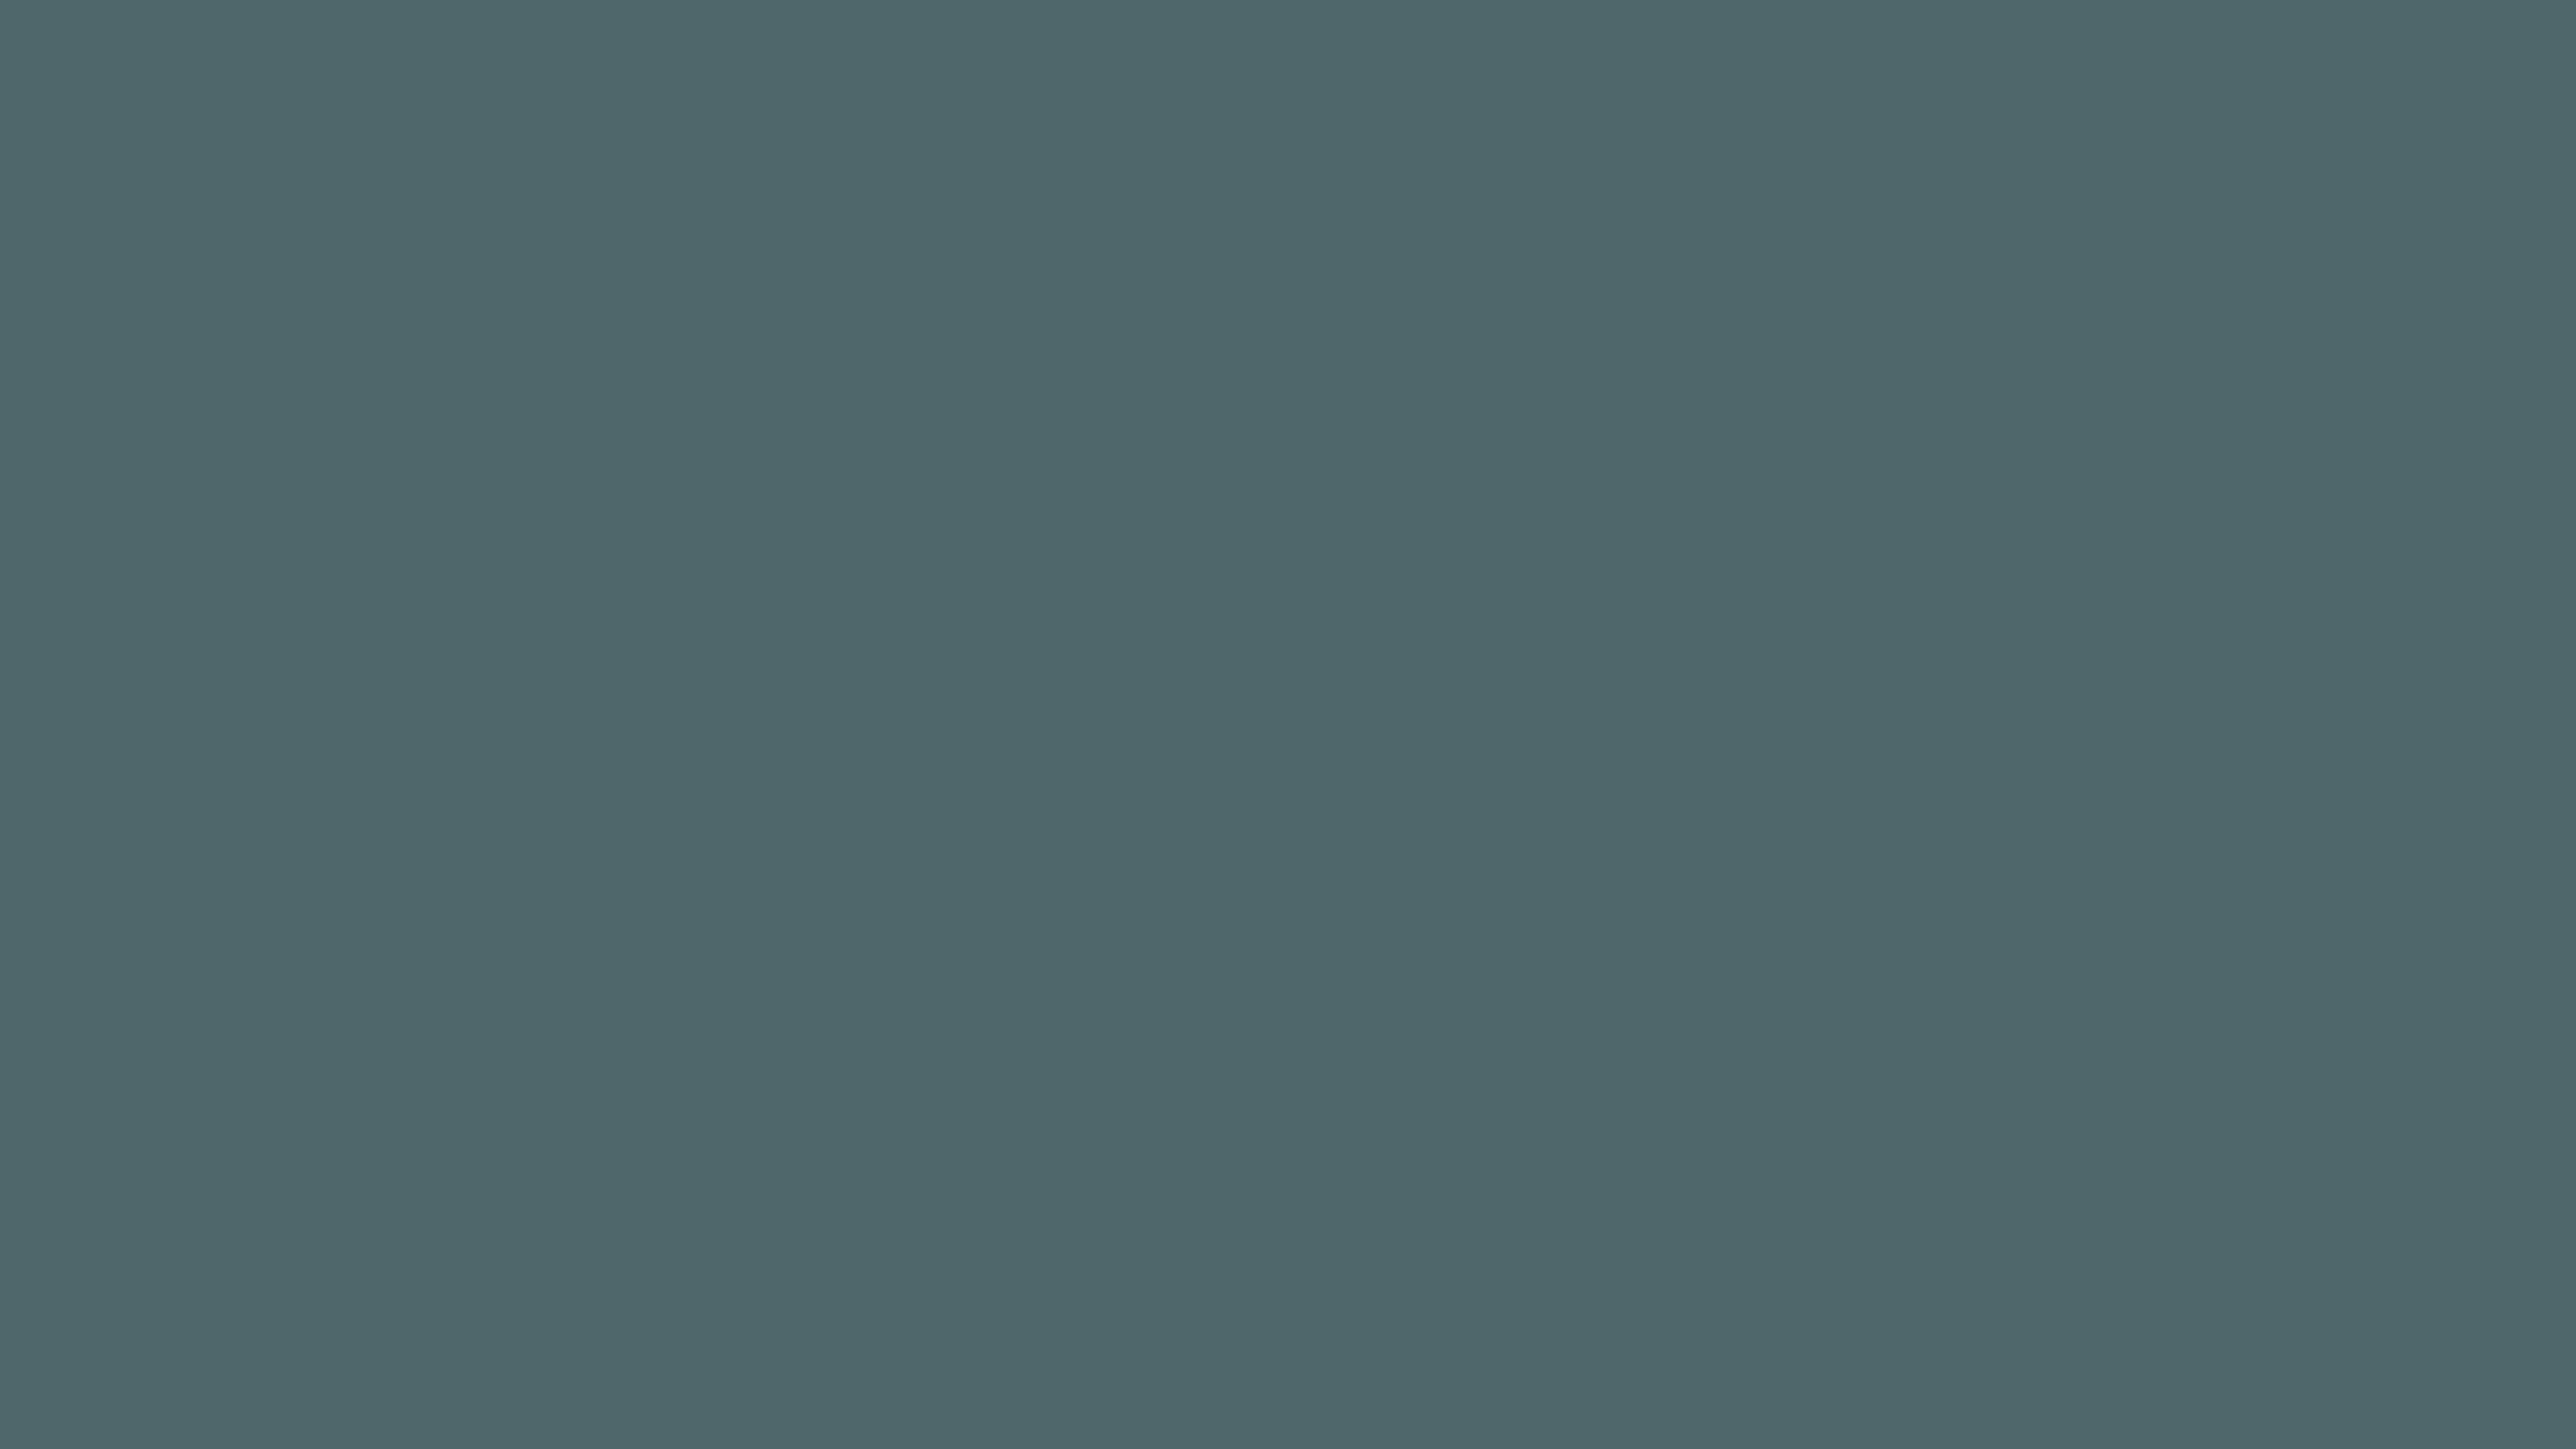 3840x2160 Stormcloud Solid Color Background